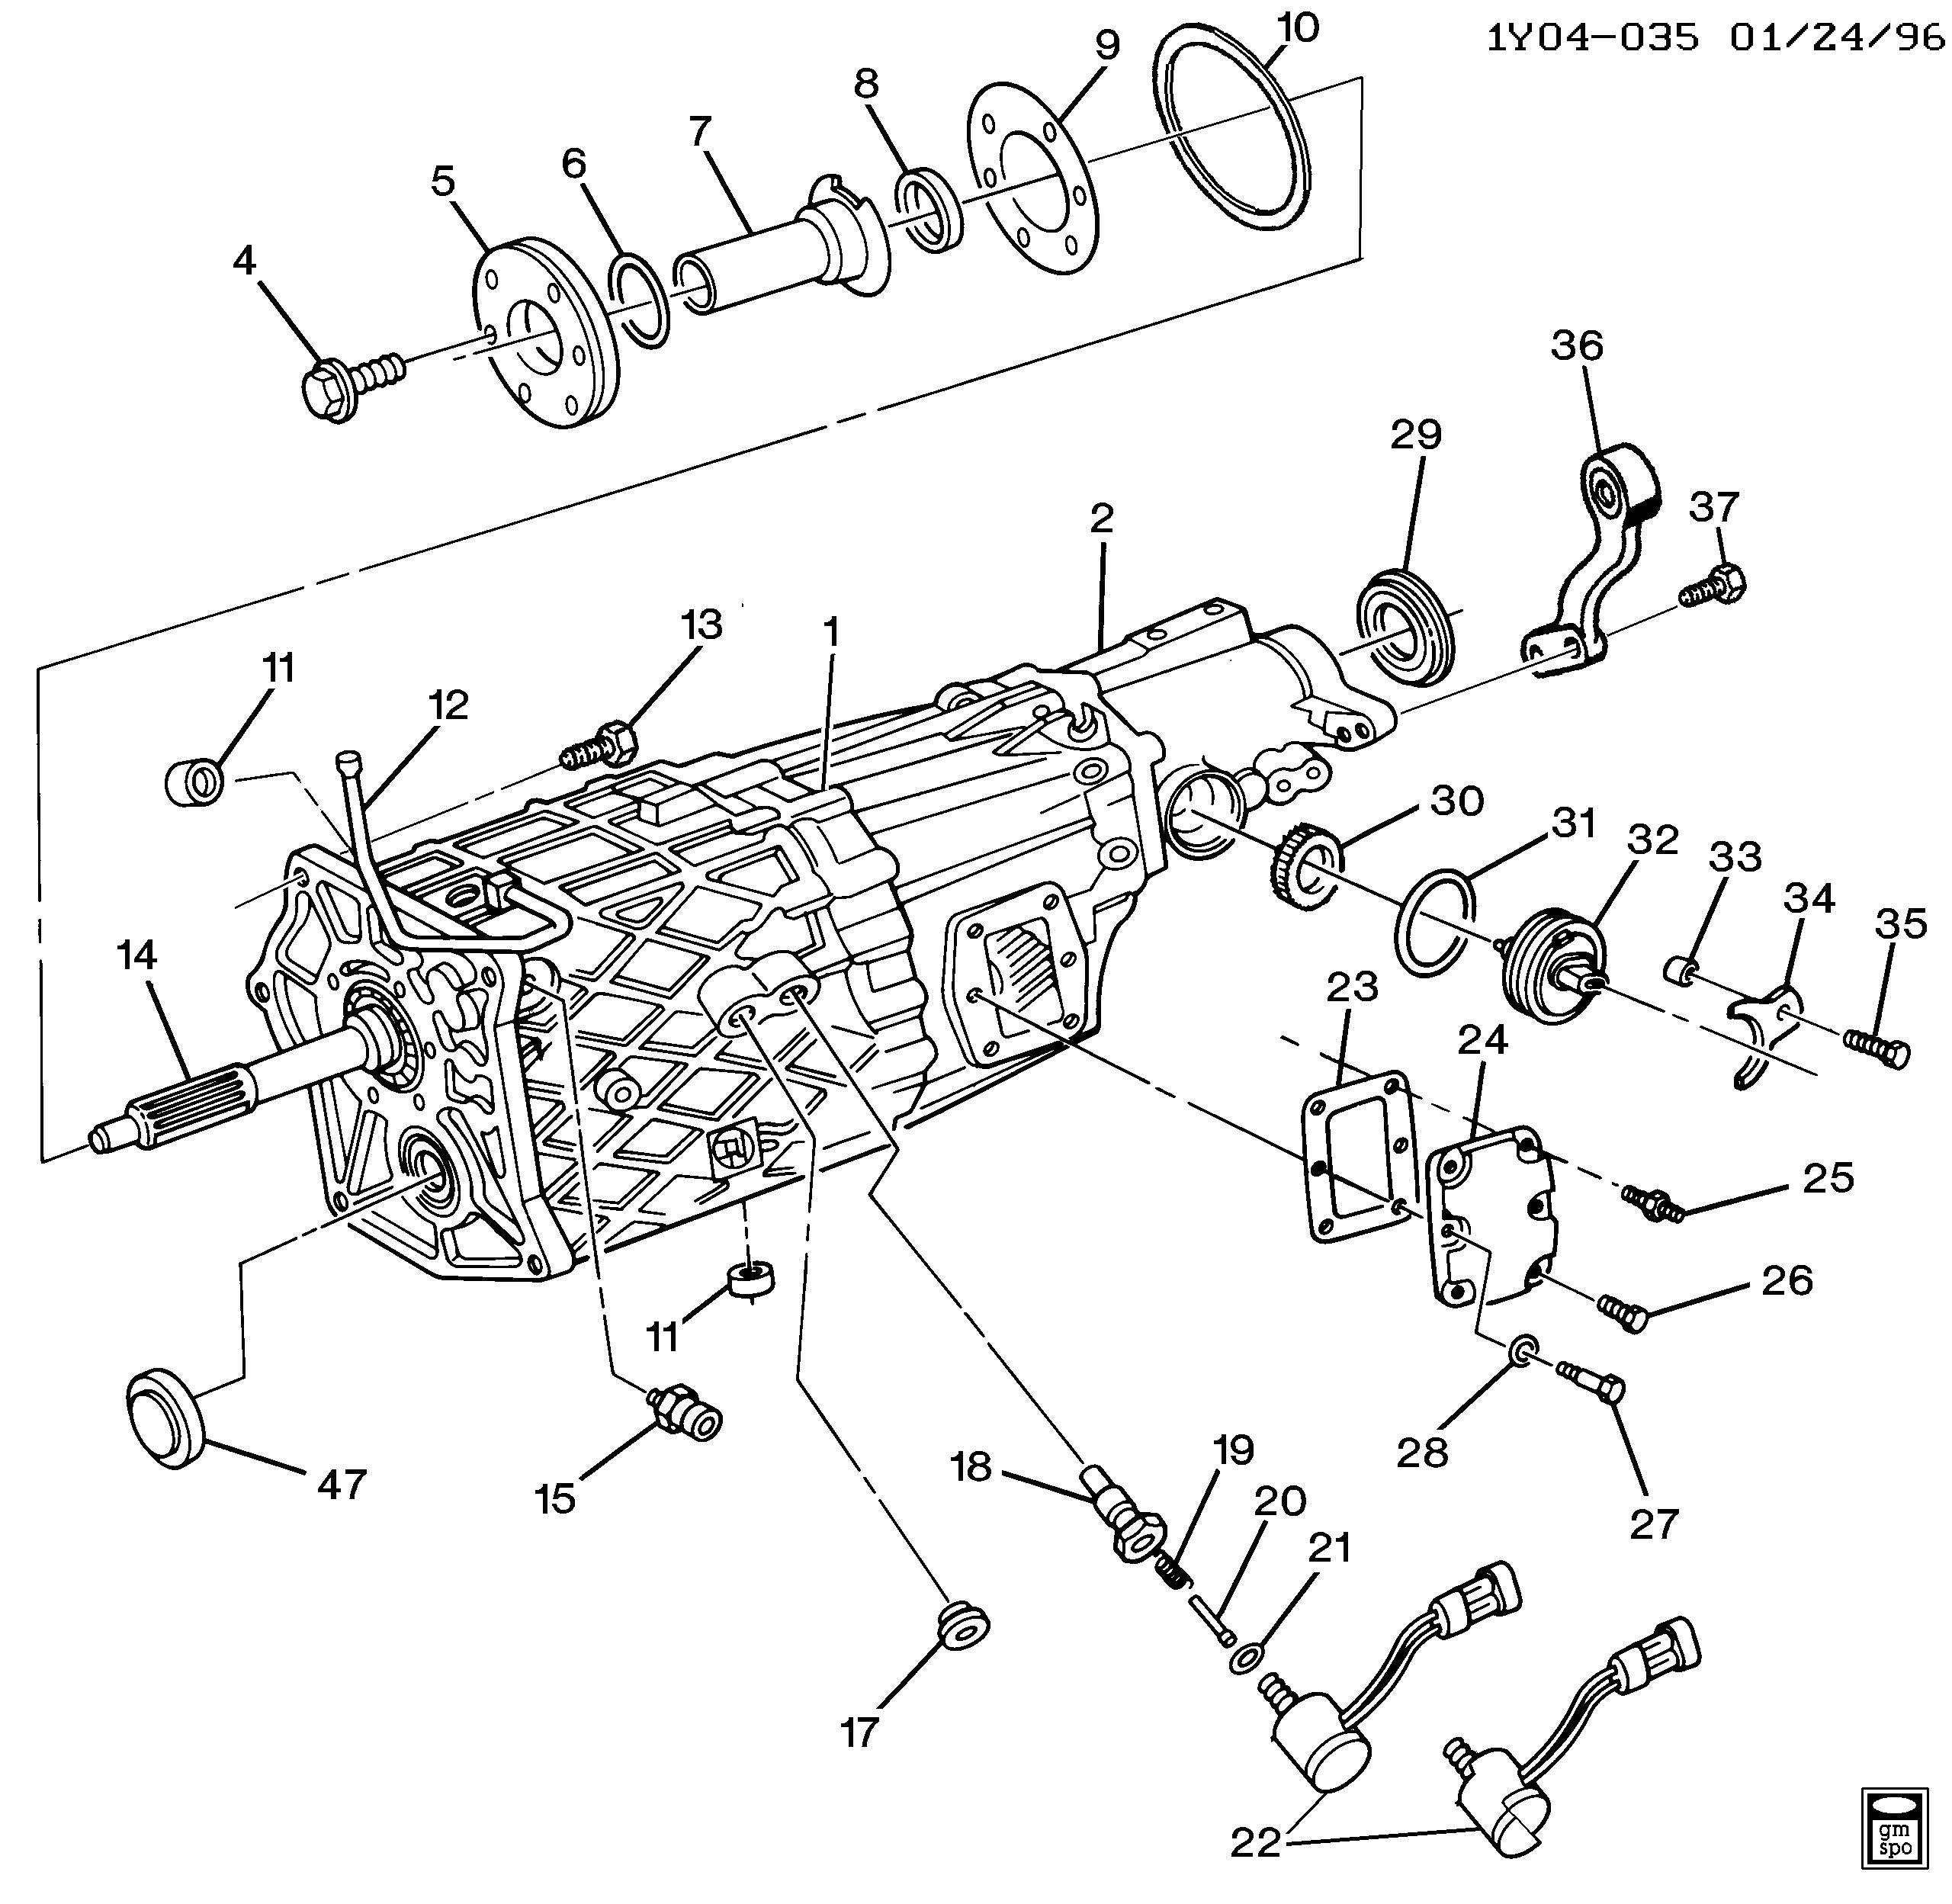 Corvette - 6-speed manual transmission zf s6-40 > Chevrolet